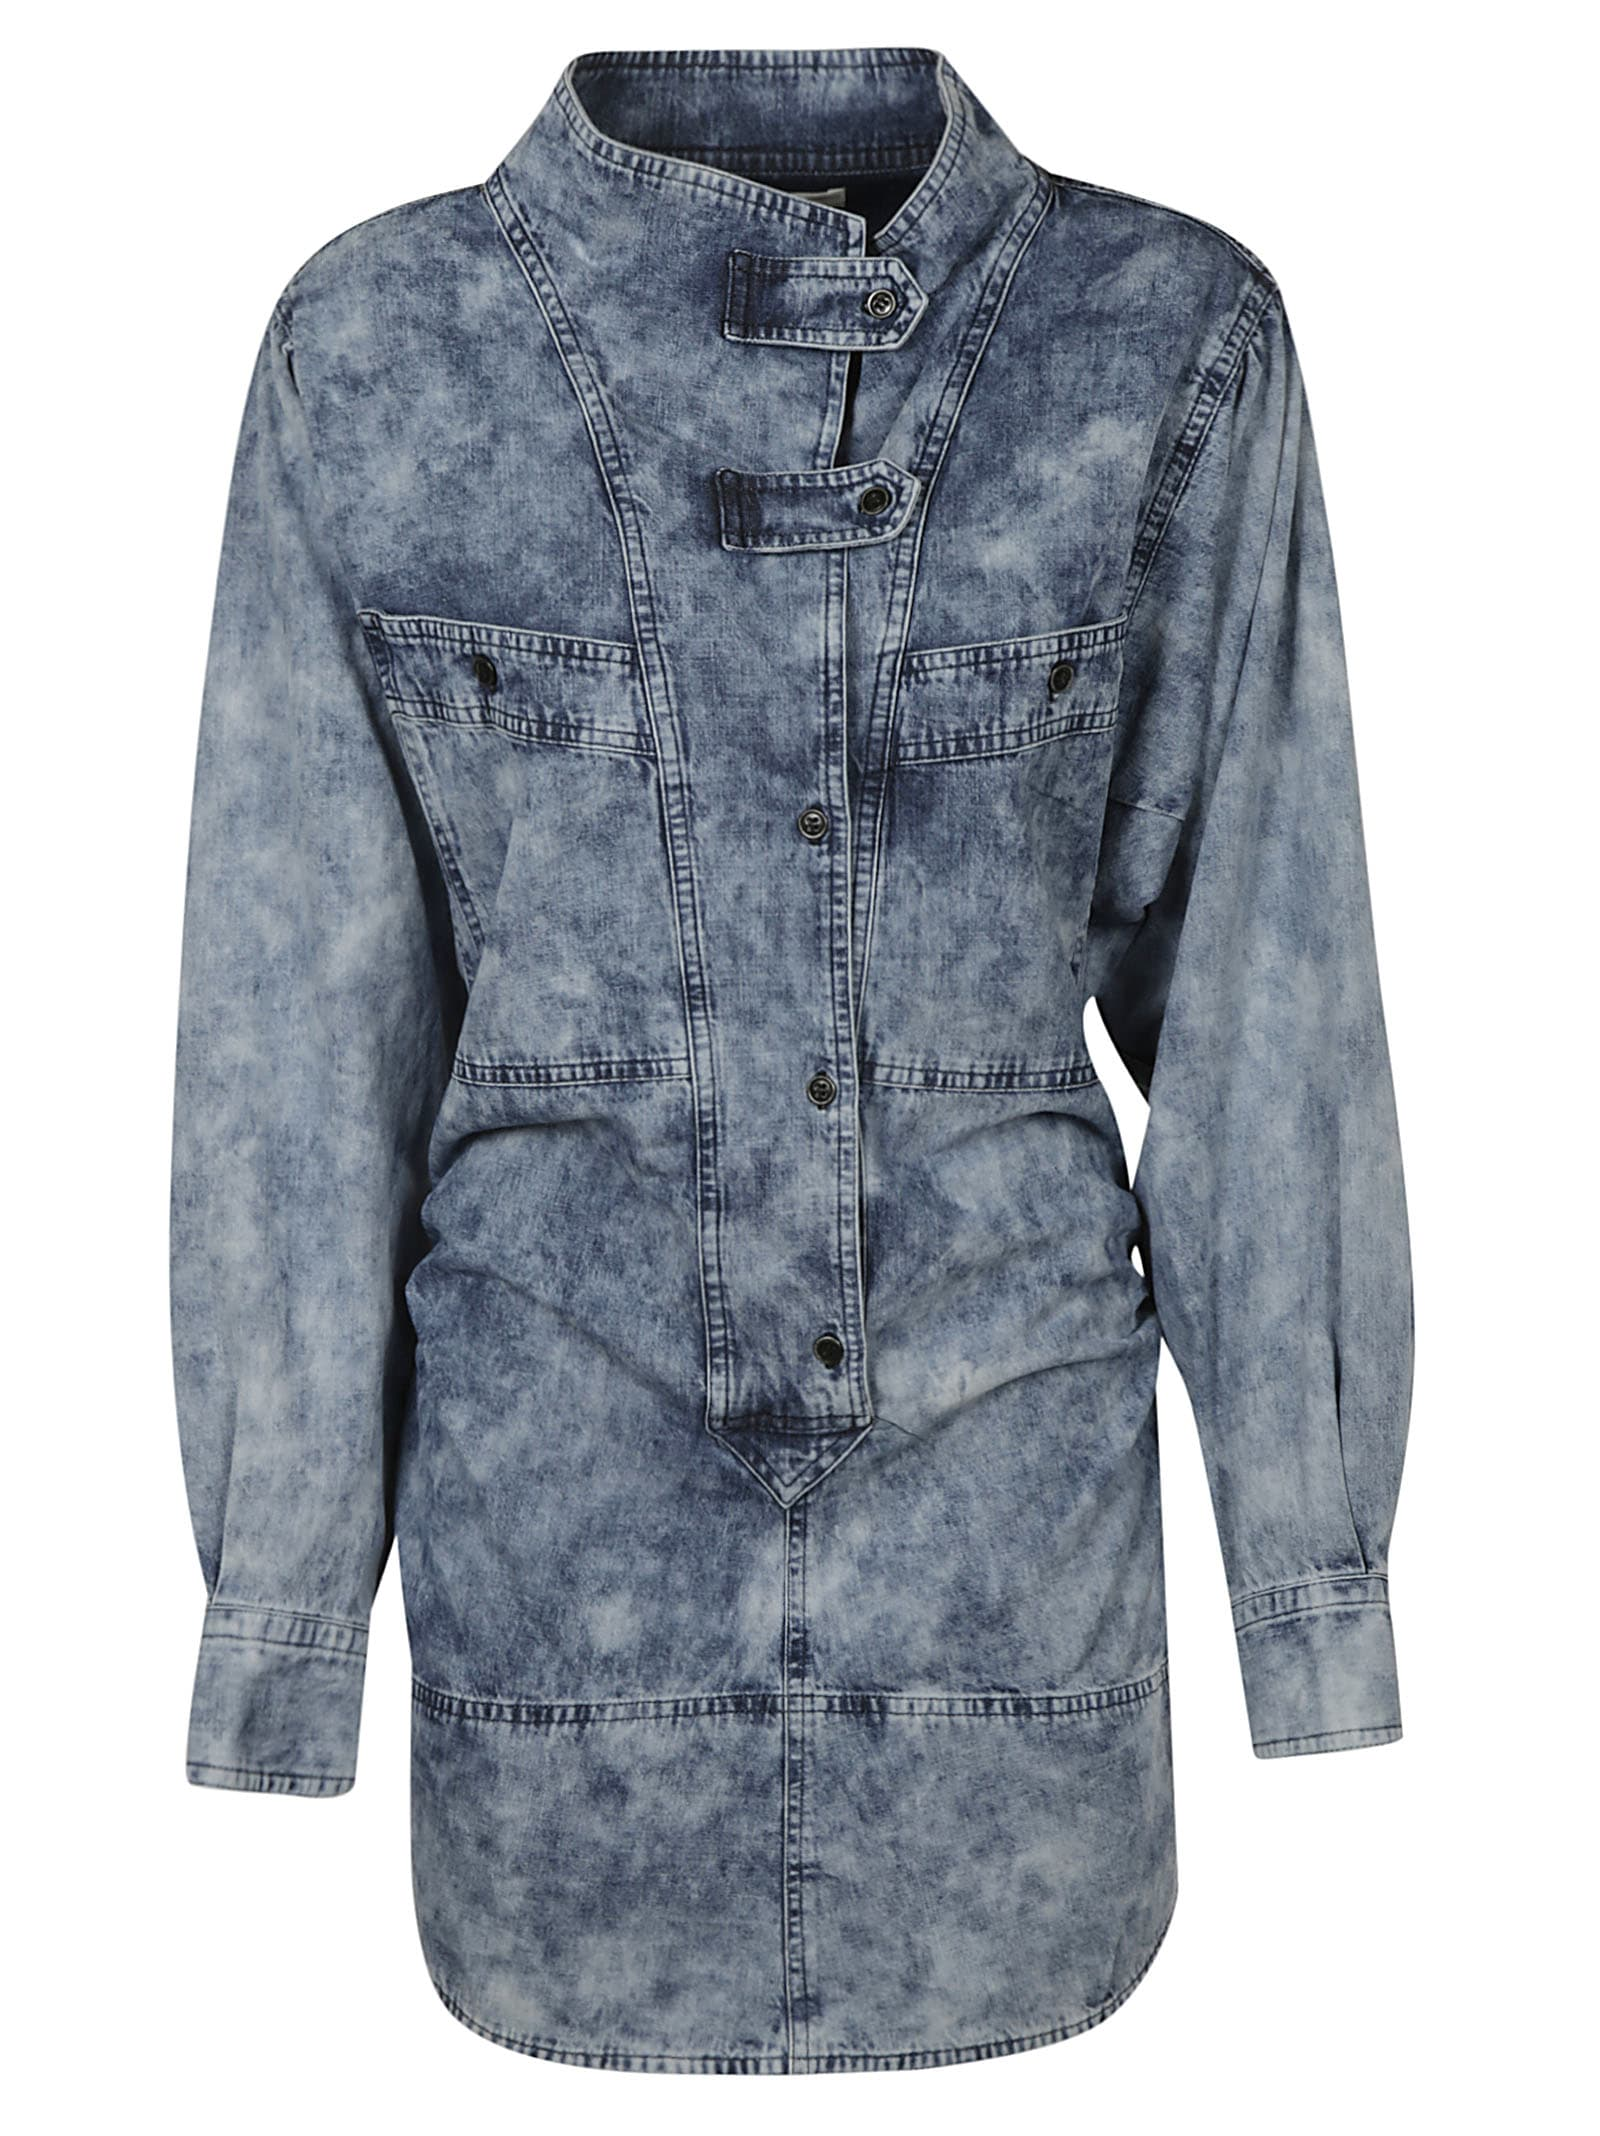 Buy Isabel Marant Denim Dress online, shop Isabel Marant with free shipping